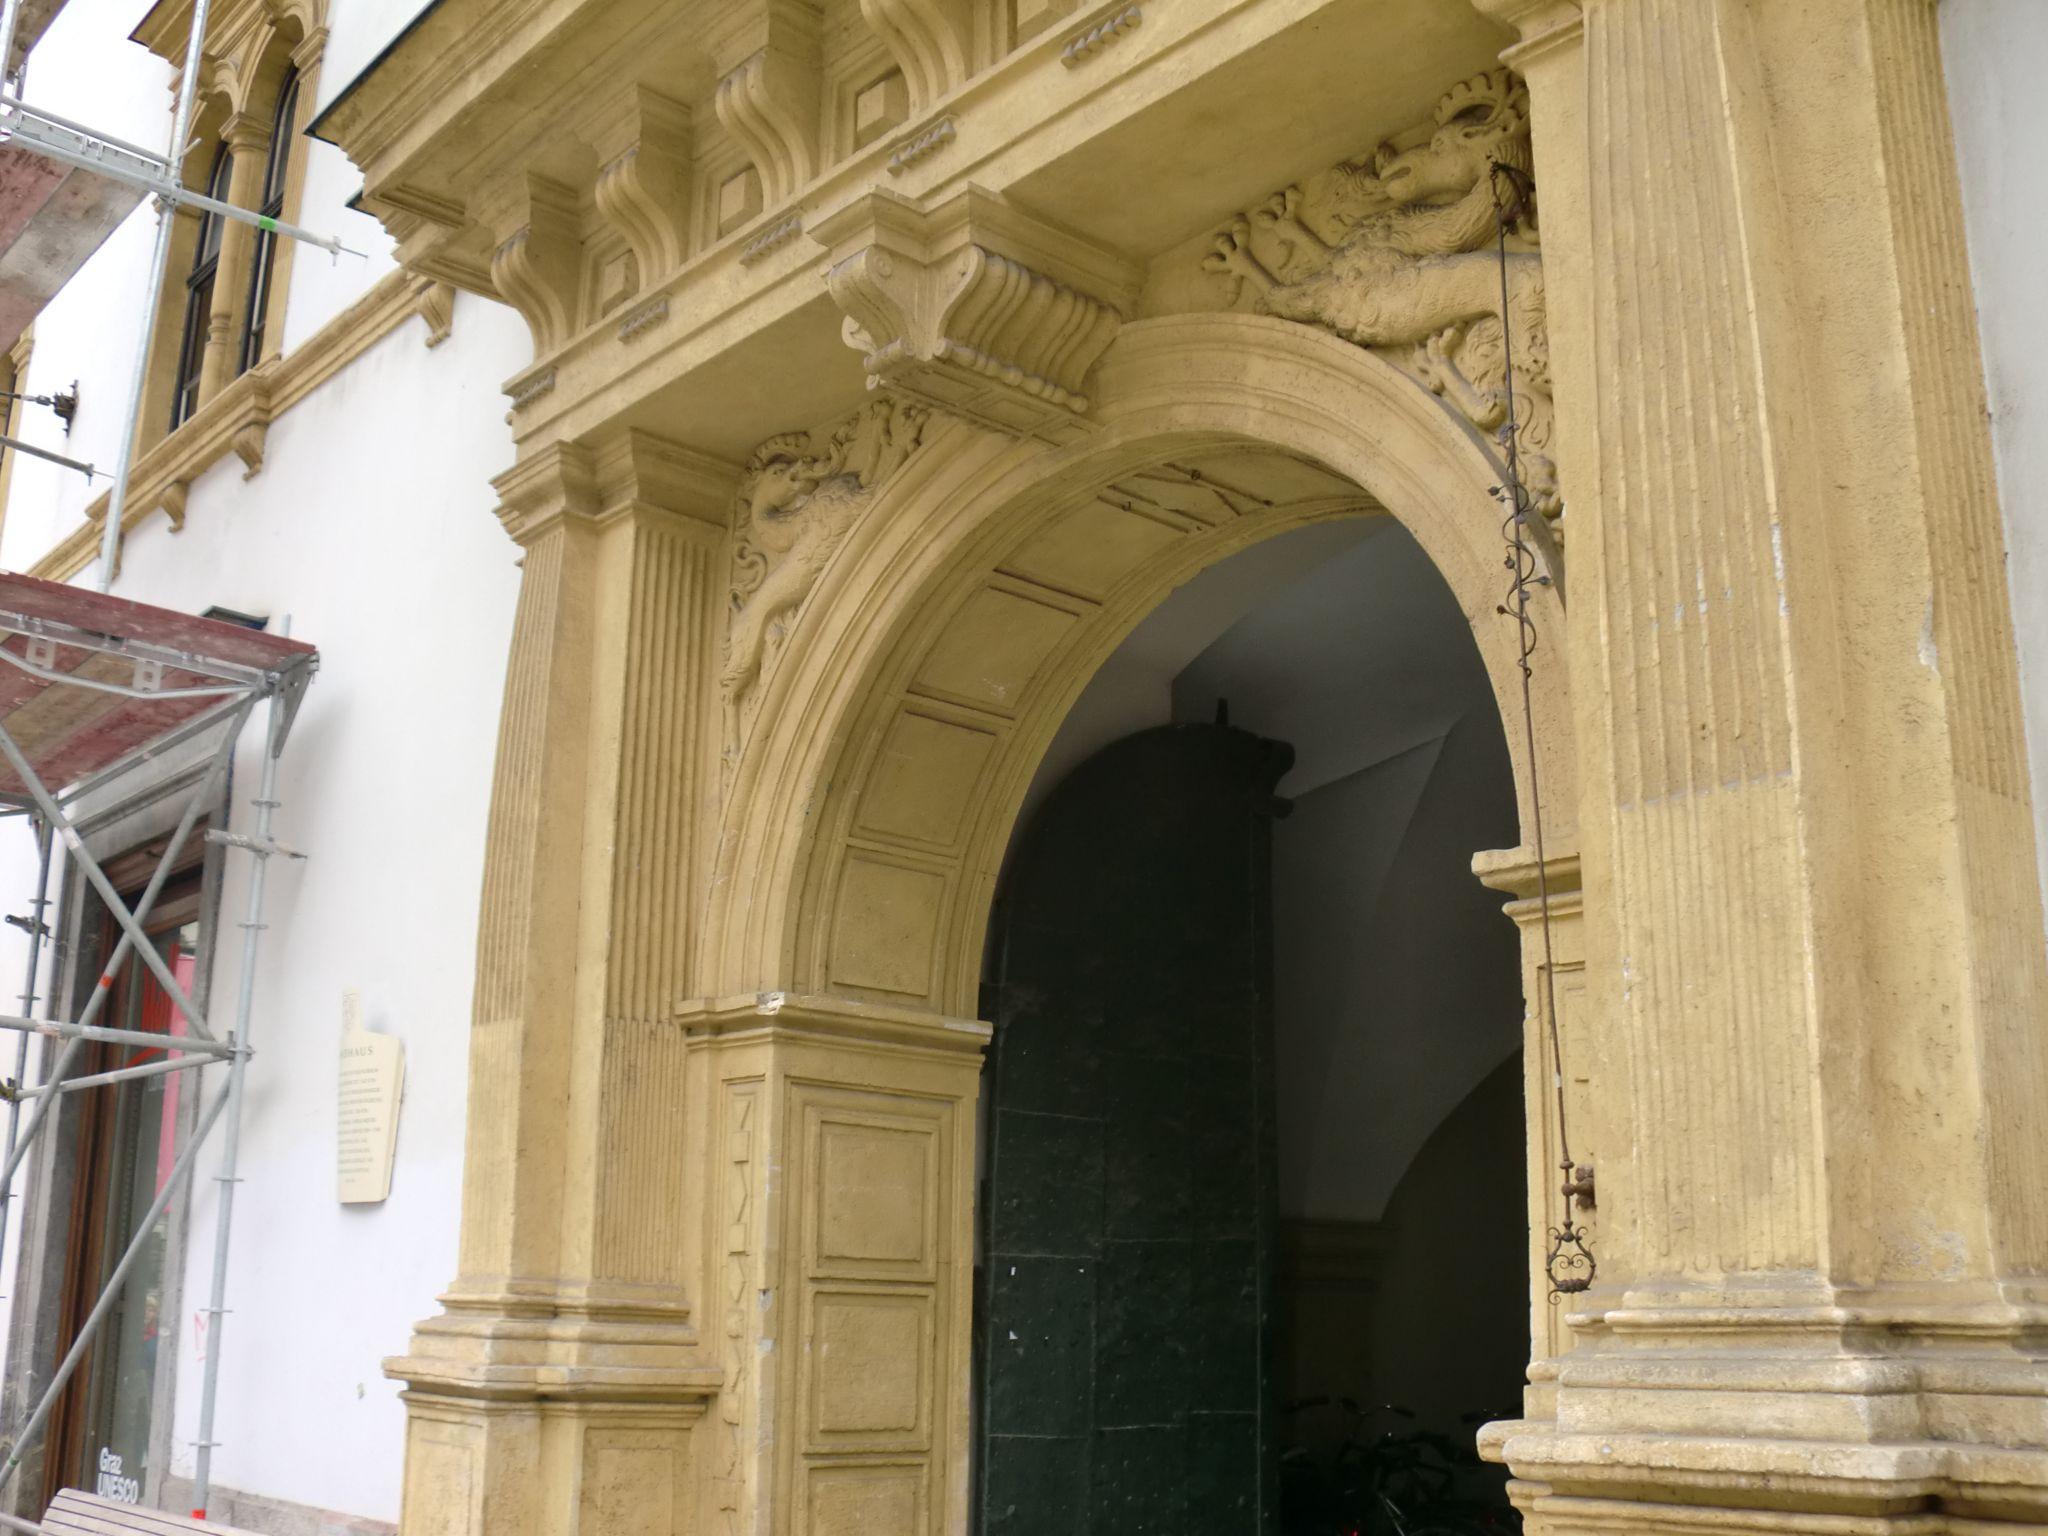 Graz museum entrance 3 - Graz: tradition and modernity